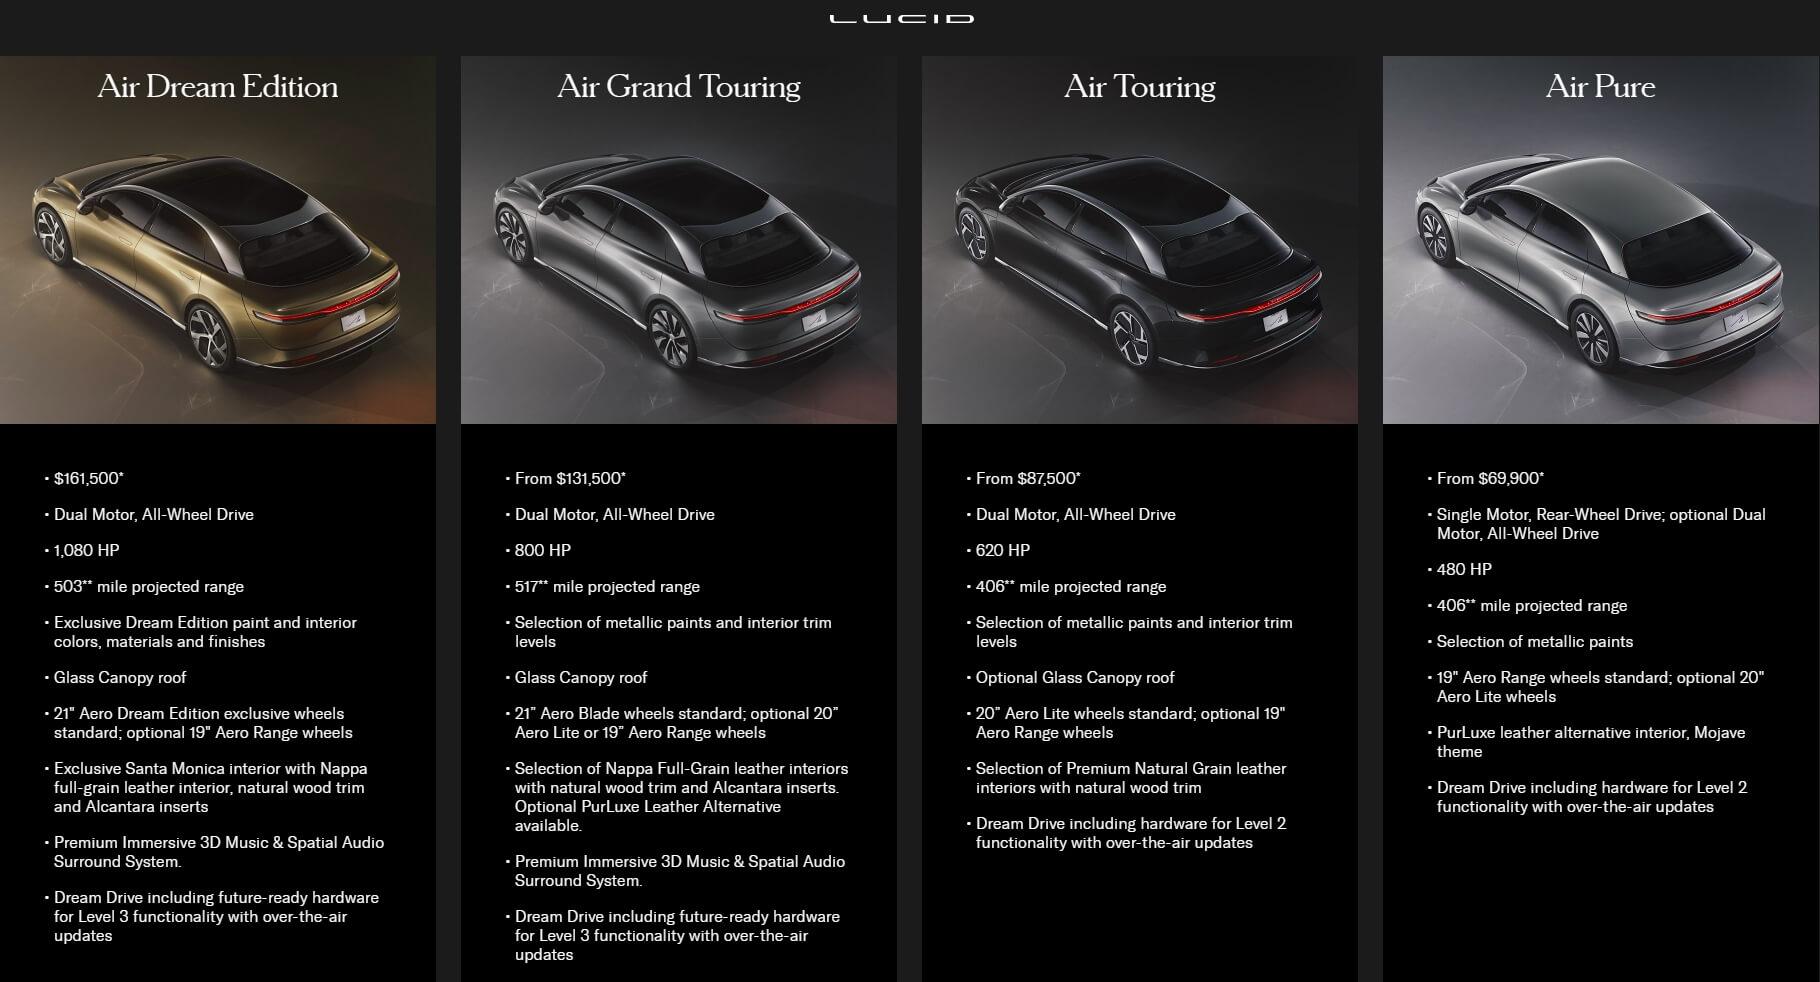 Модельный ряд Lucid Air: Dream Edition → Grand Touring → Touring → Pure